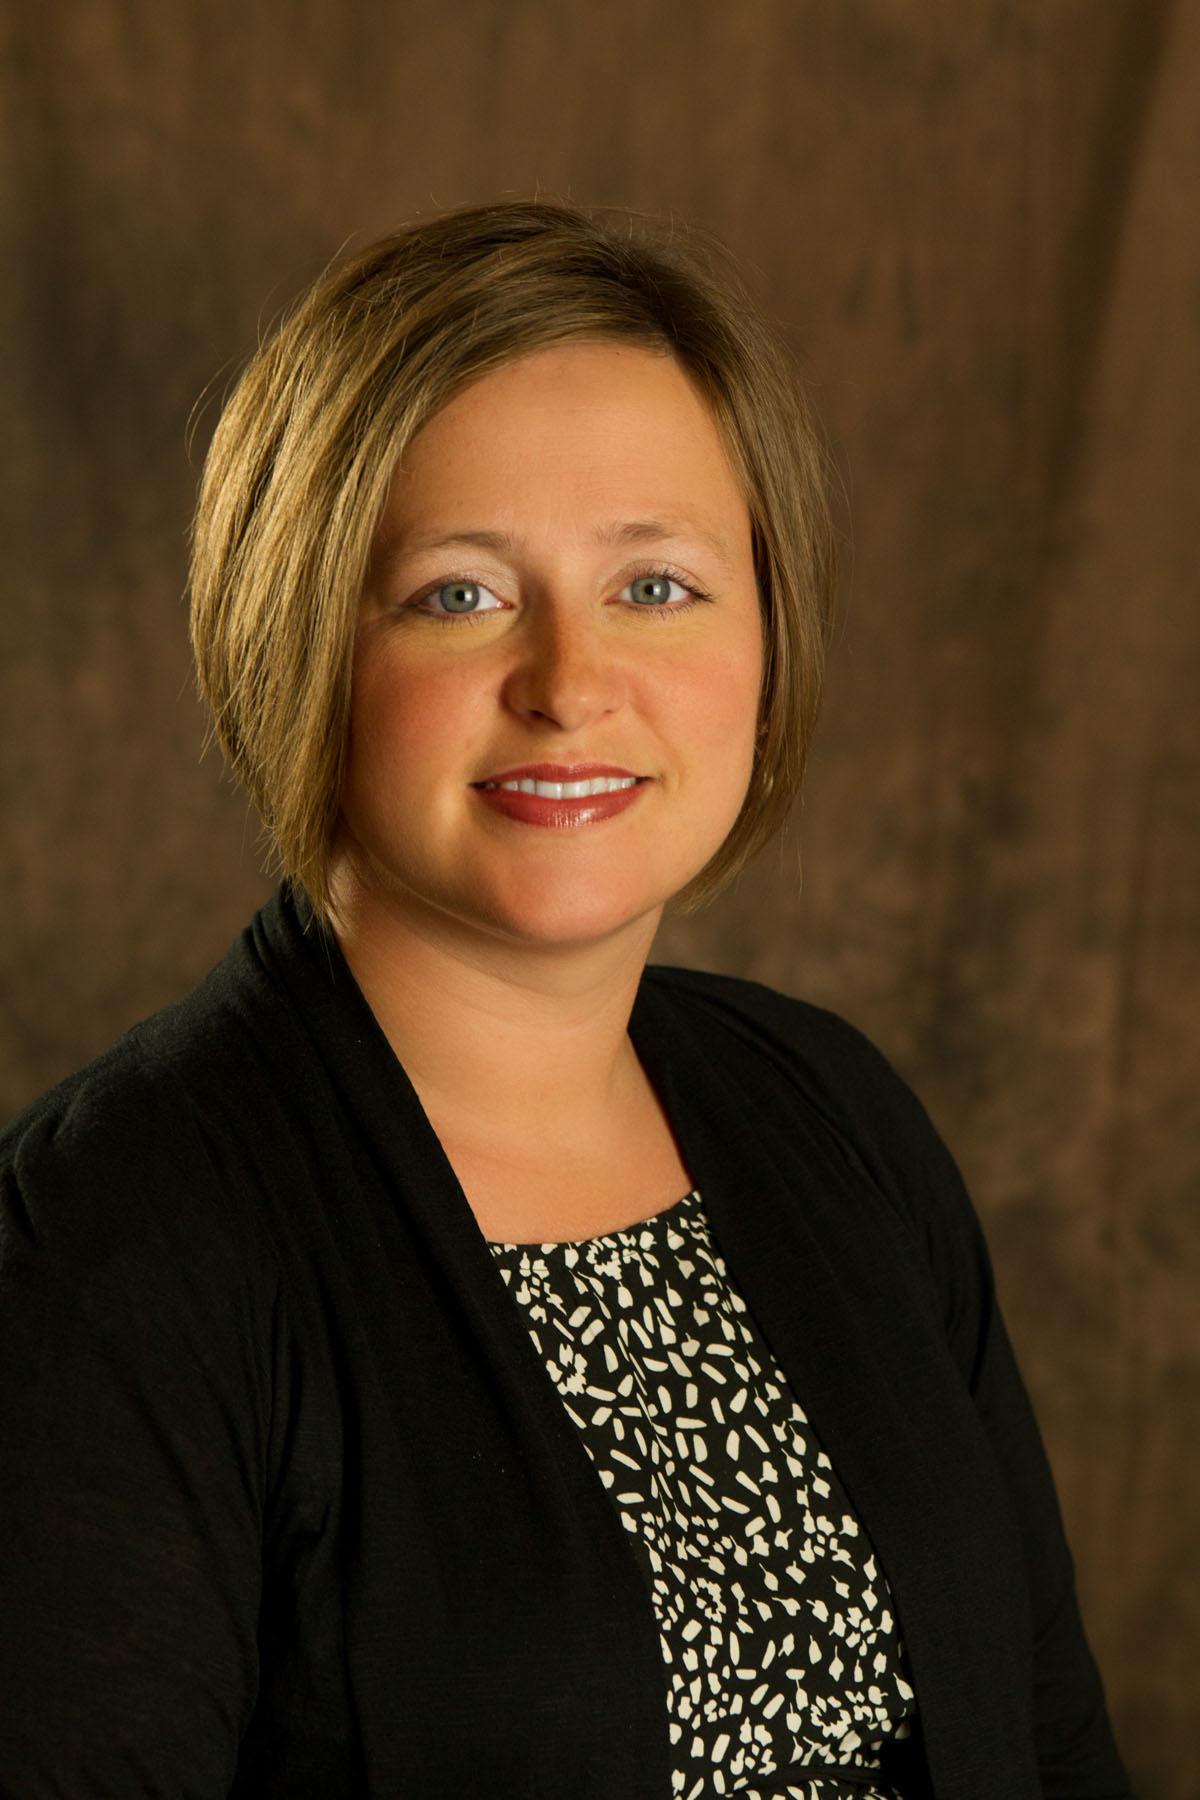 Jennifer Newhouse Vineyard Asset Management Llc